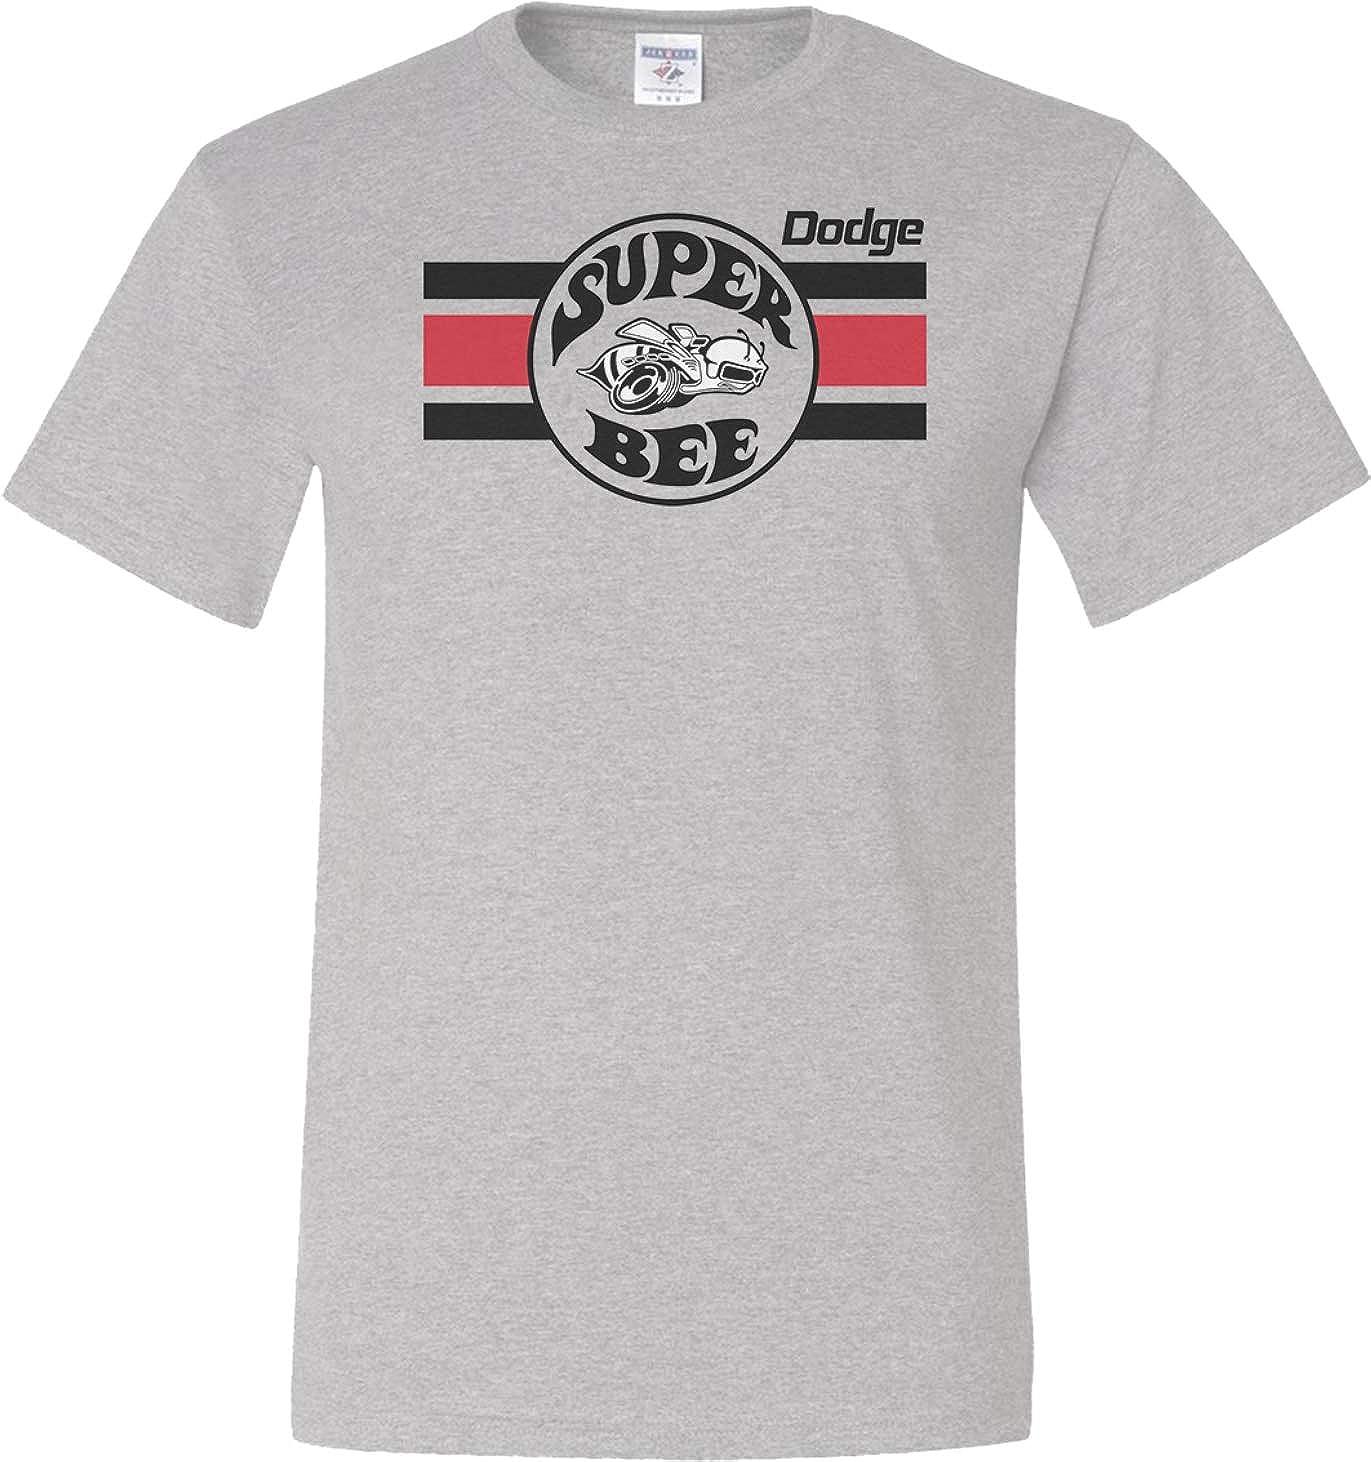 Dodge Super Bee Stripe Tall Shirt